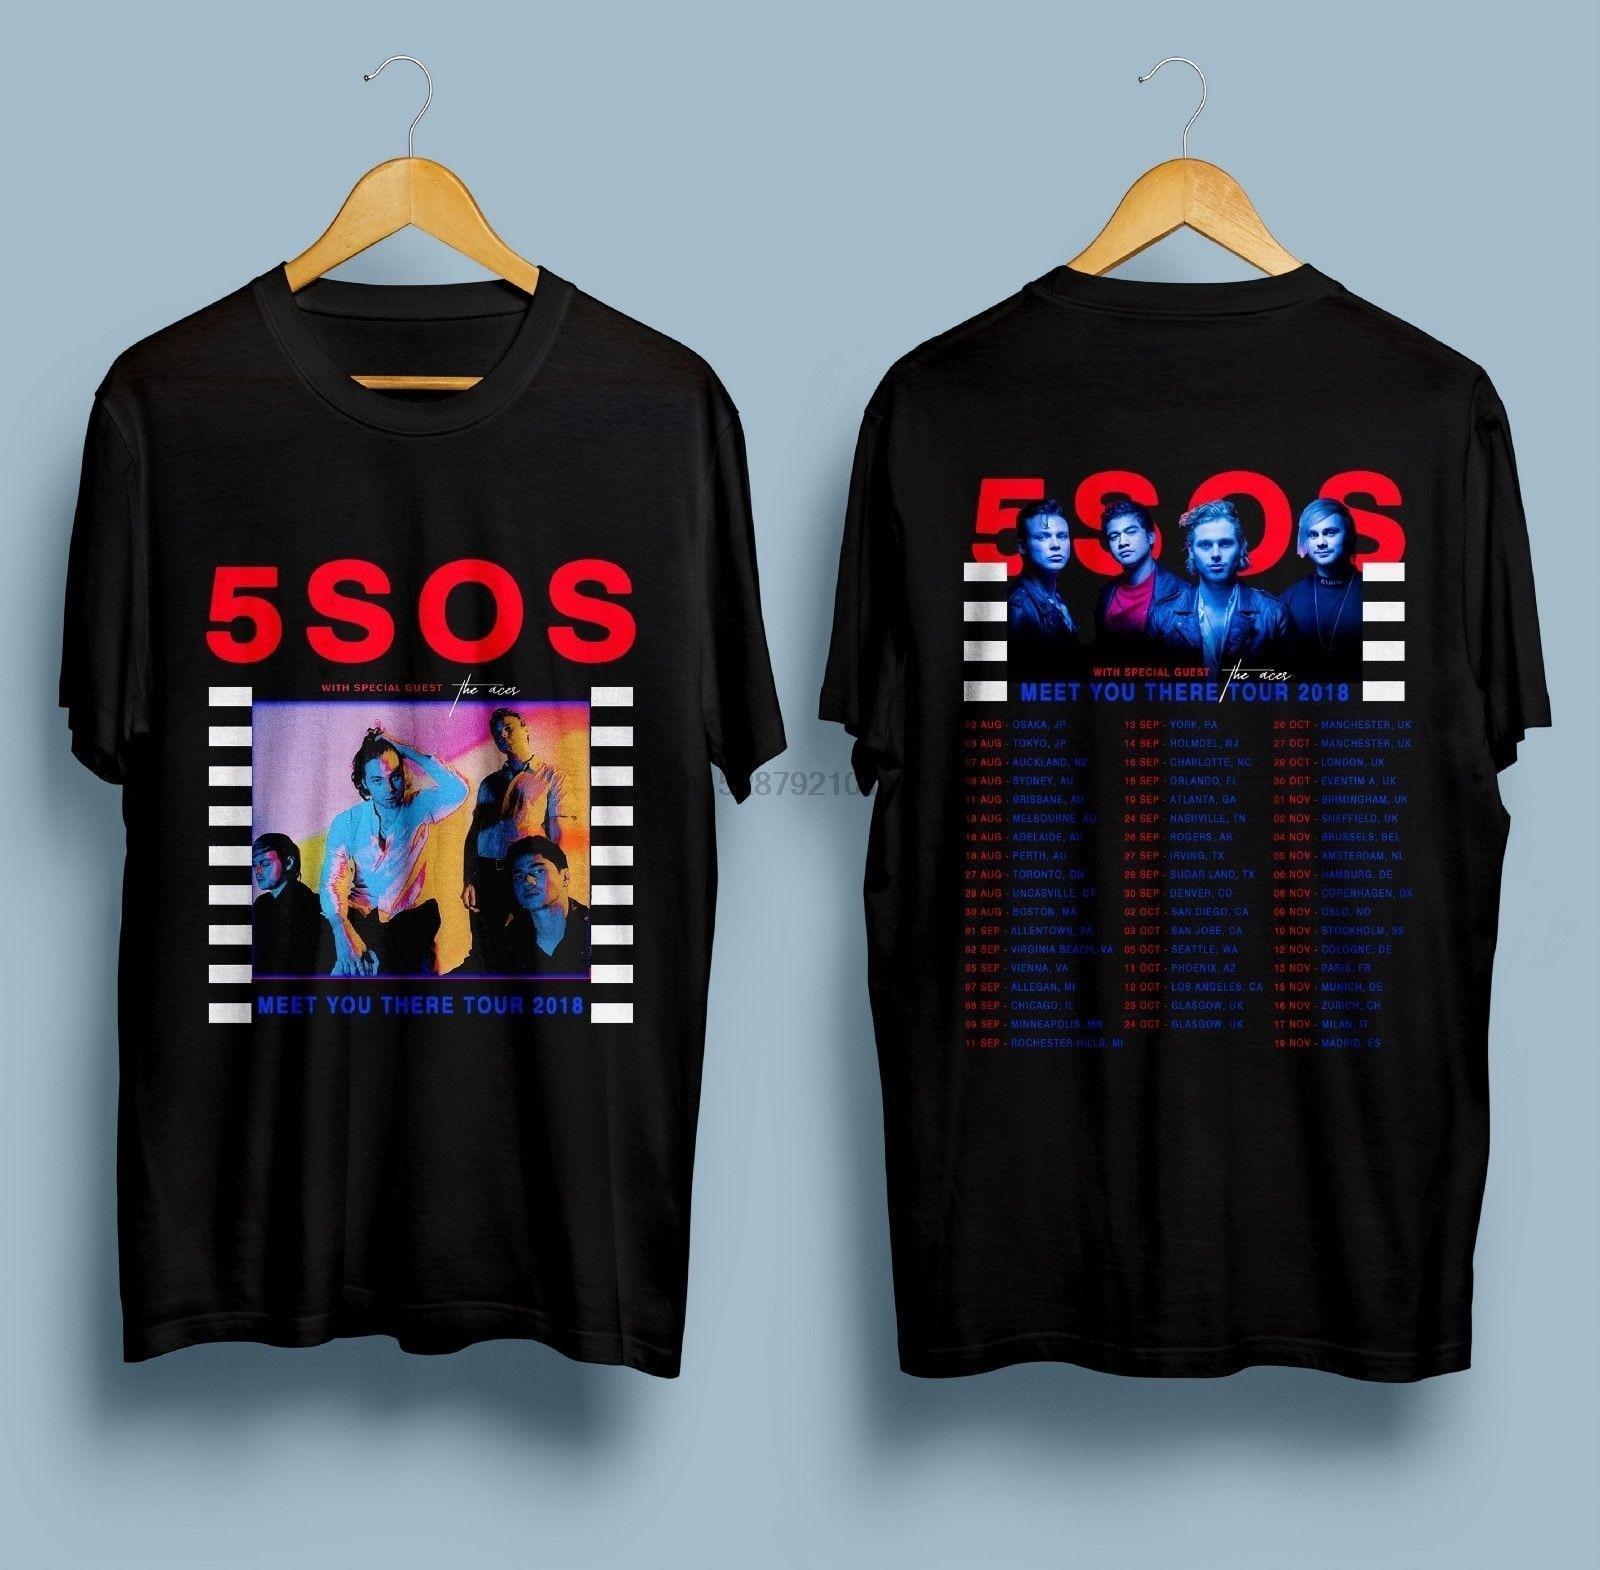 Nuevo 5 Seconds Of Summer 5Sos Meet You alla Tour Dates 2018 Camiseta talla S 3Xl hombres camiseta 2019 verano 100% algodón